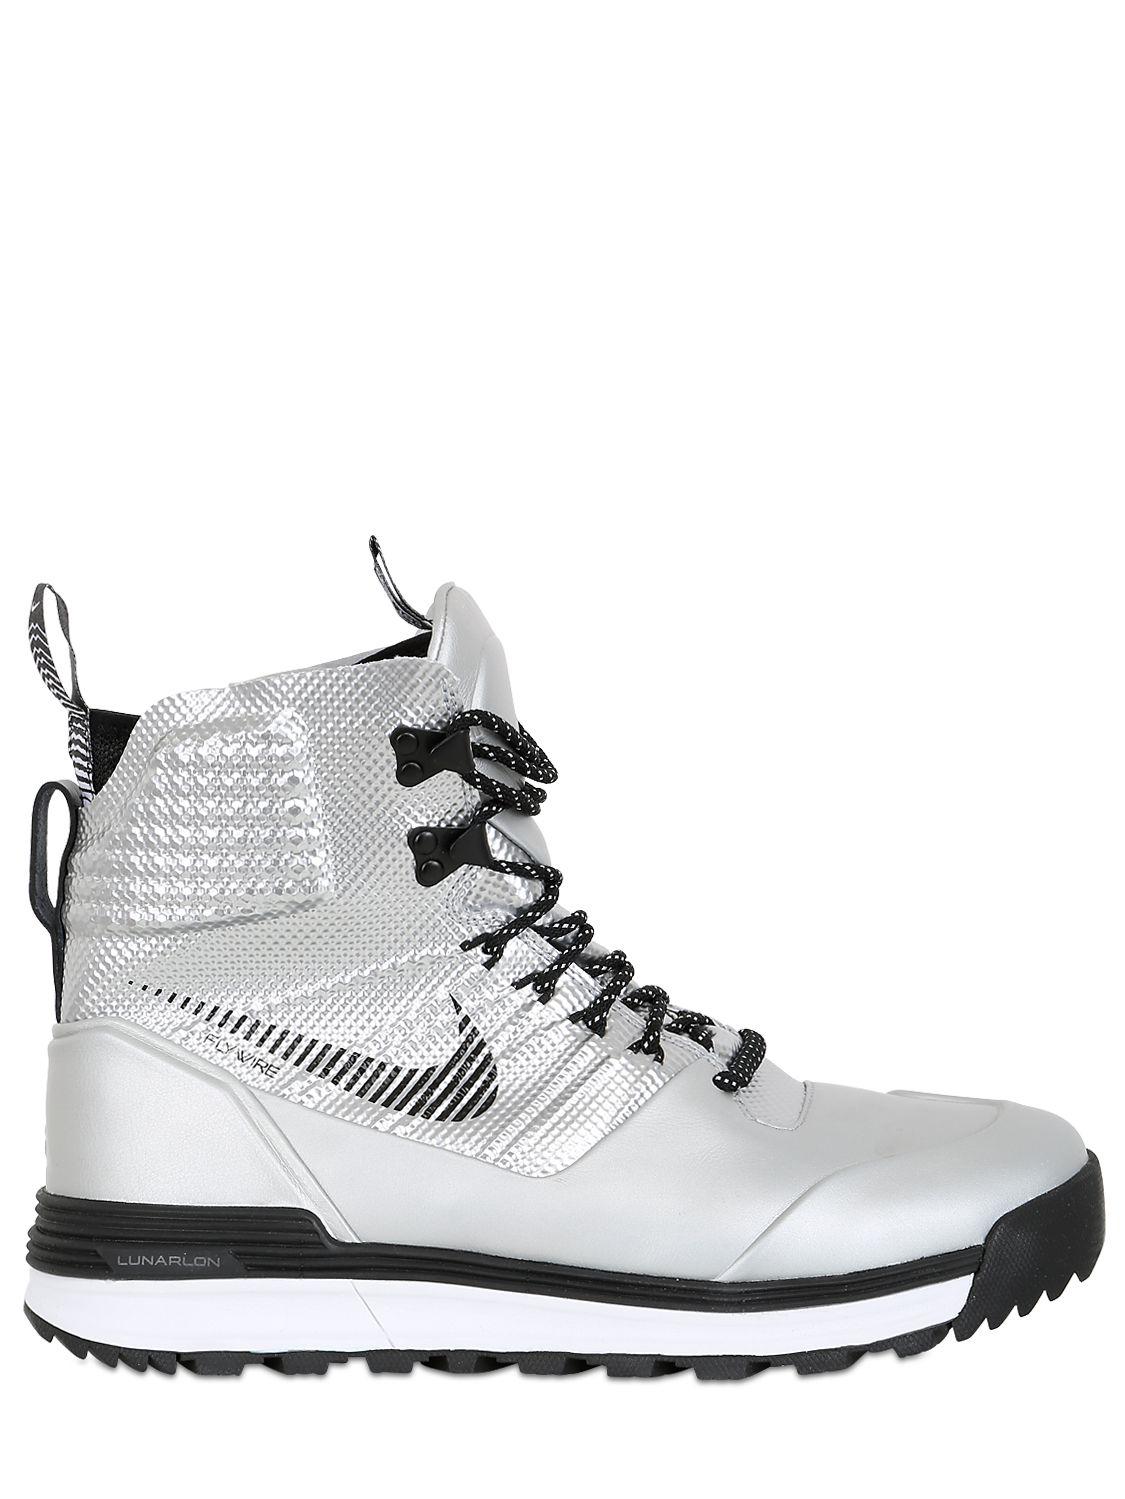 quality design 2418f dab6a Lyst - Nike Lunarterra Arktos Qs Superbowl Sneakers in Metallic for Men